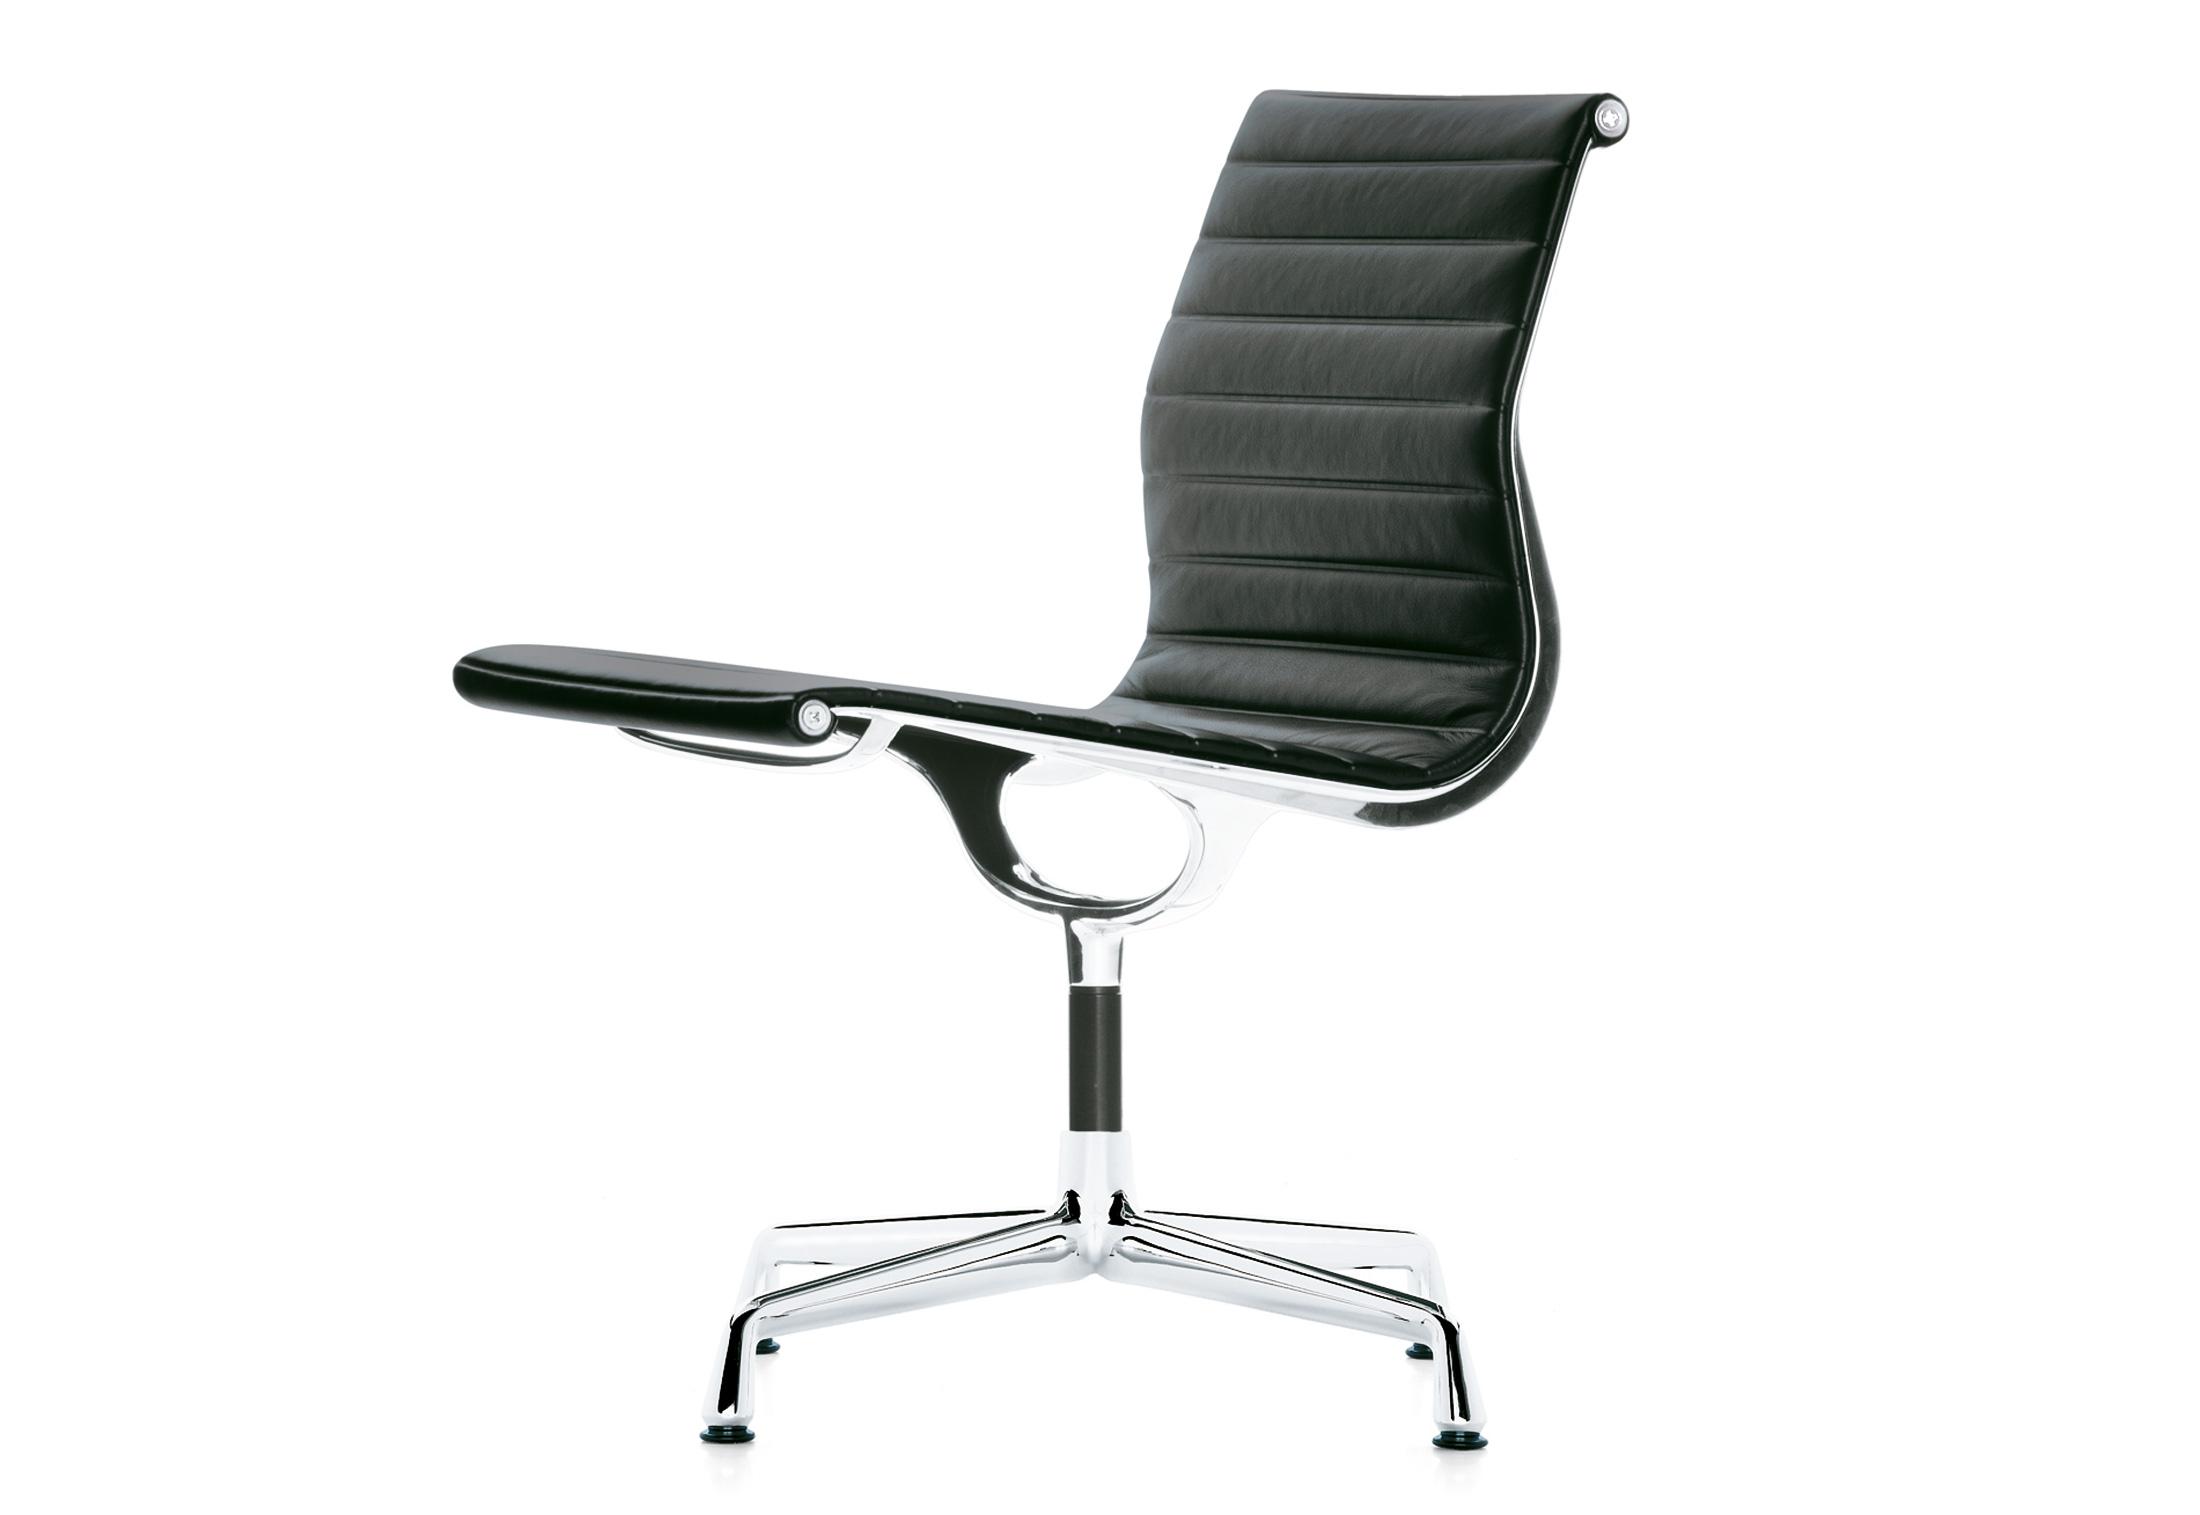 Sedie Ufficio Vitra : Aluminium chair by vitra stylepark